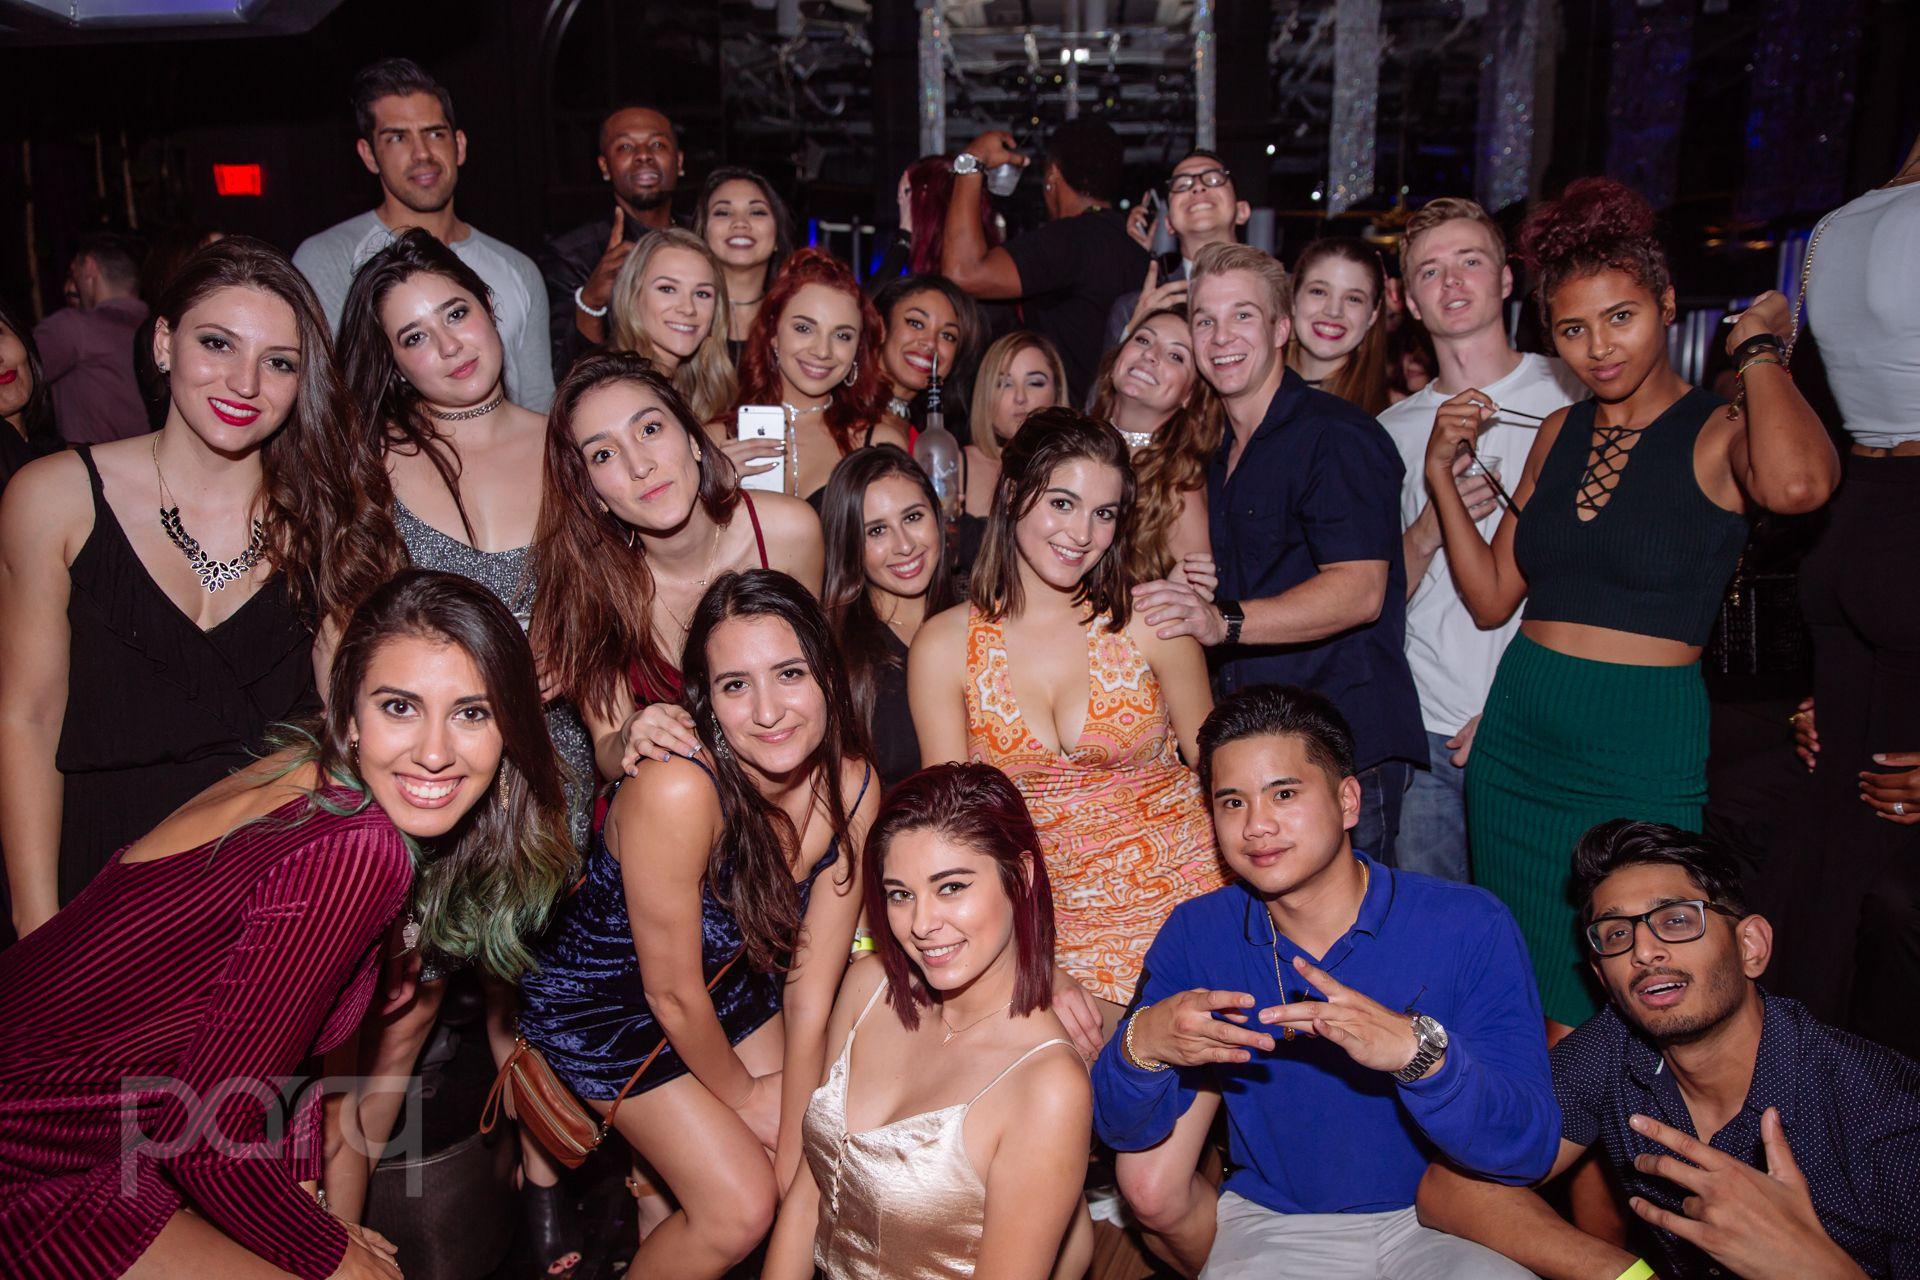 01.19.18 Parq - DJ Hollywood-18.jpg